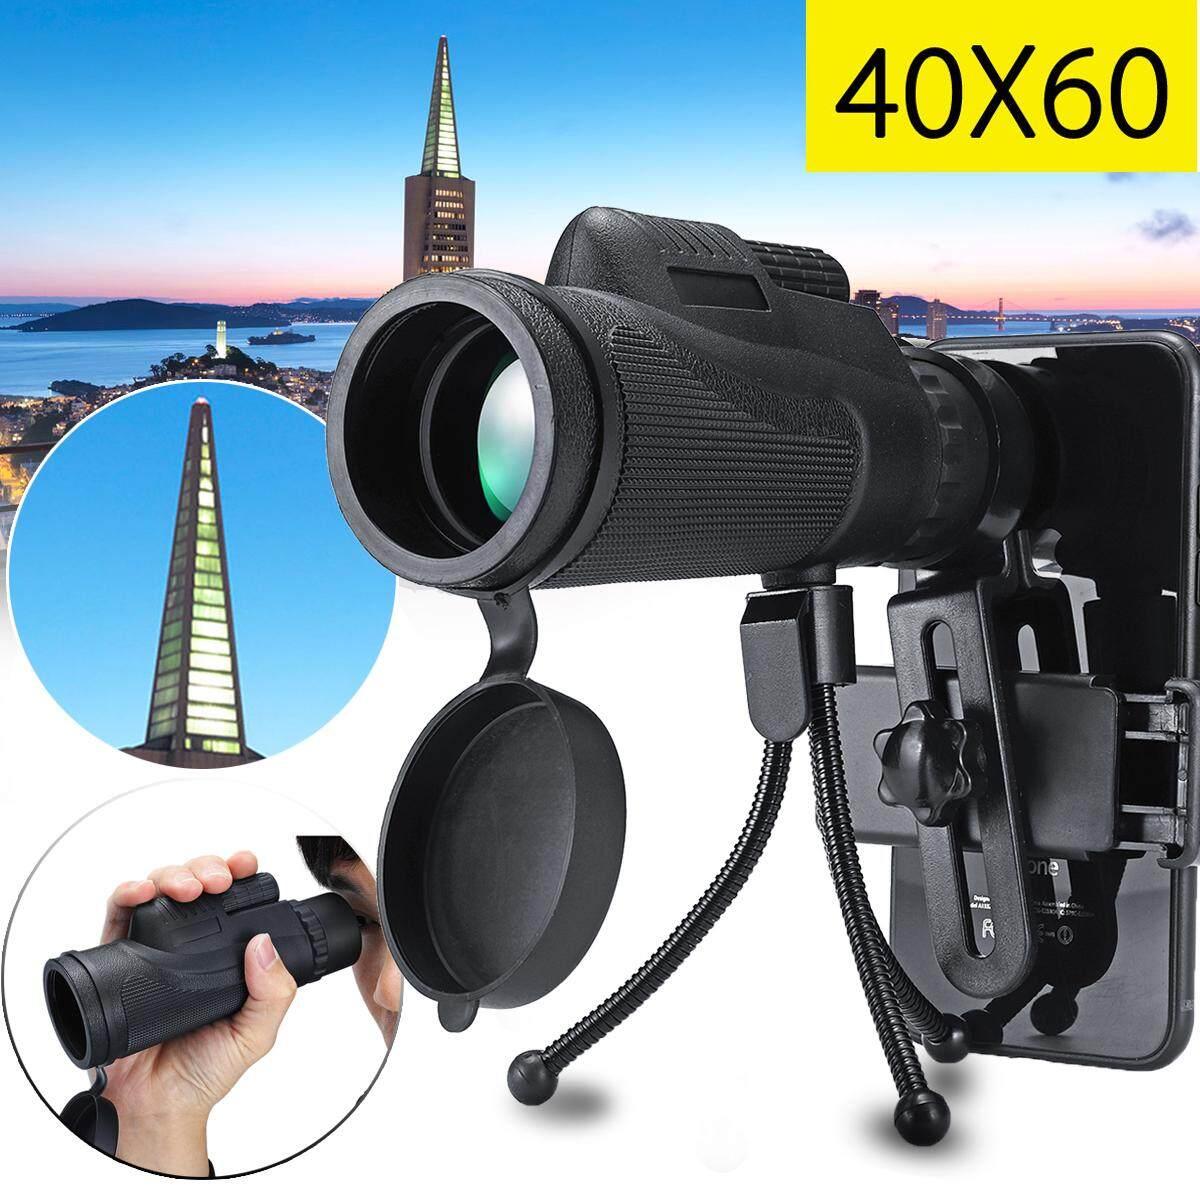 【free Pengiriman + Flash Deal】40x60 Zoom Teleskop Optik Tele Teleskop Ponsel Lensa Kamera Klip Tripod By Teamwin.